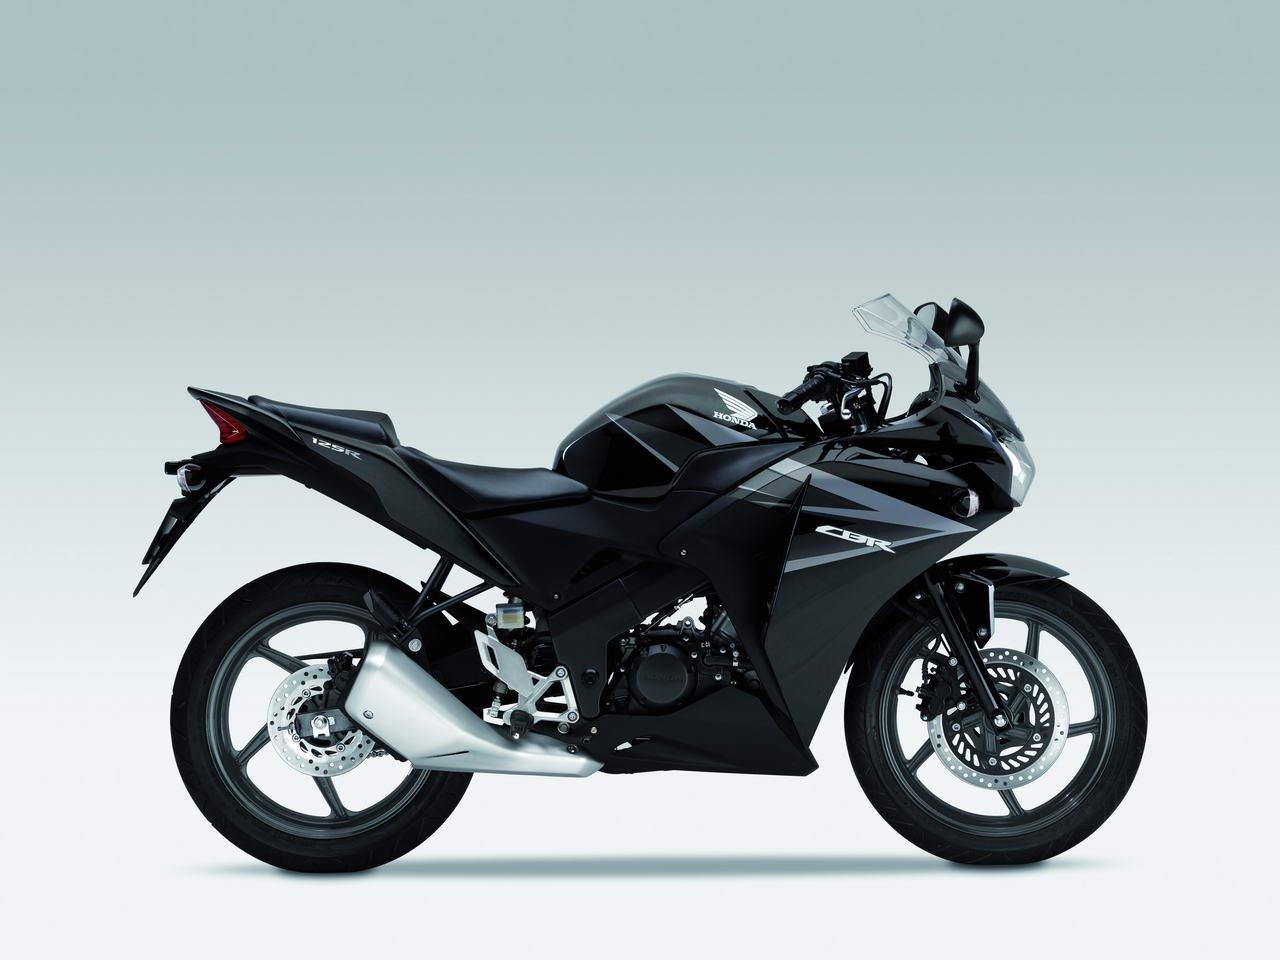 Listino Honda Crosstourer ABS DCT Granturismo on-off - image 14656_honda-cbr125-r on http://moto.motori.net